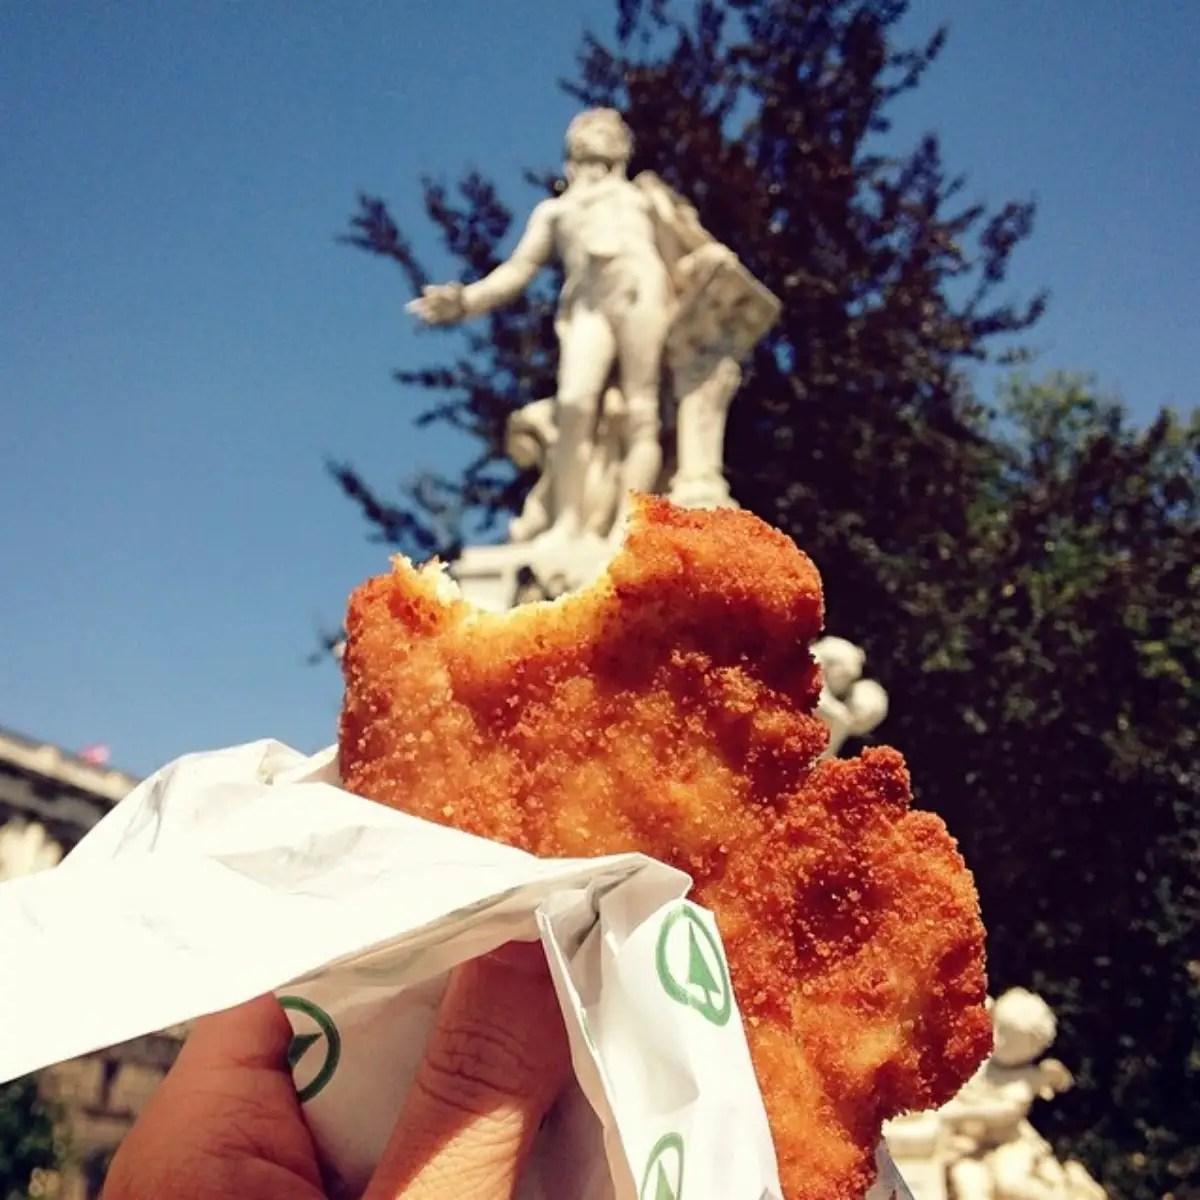 Schnitzel in front of the Mozart statue in Vienna.